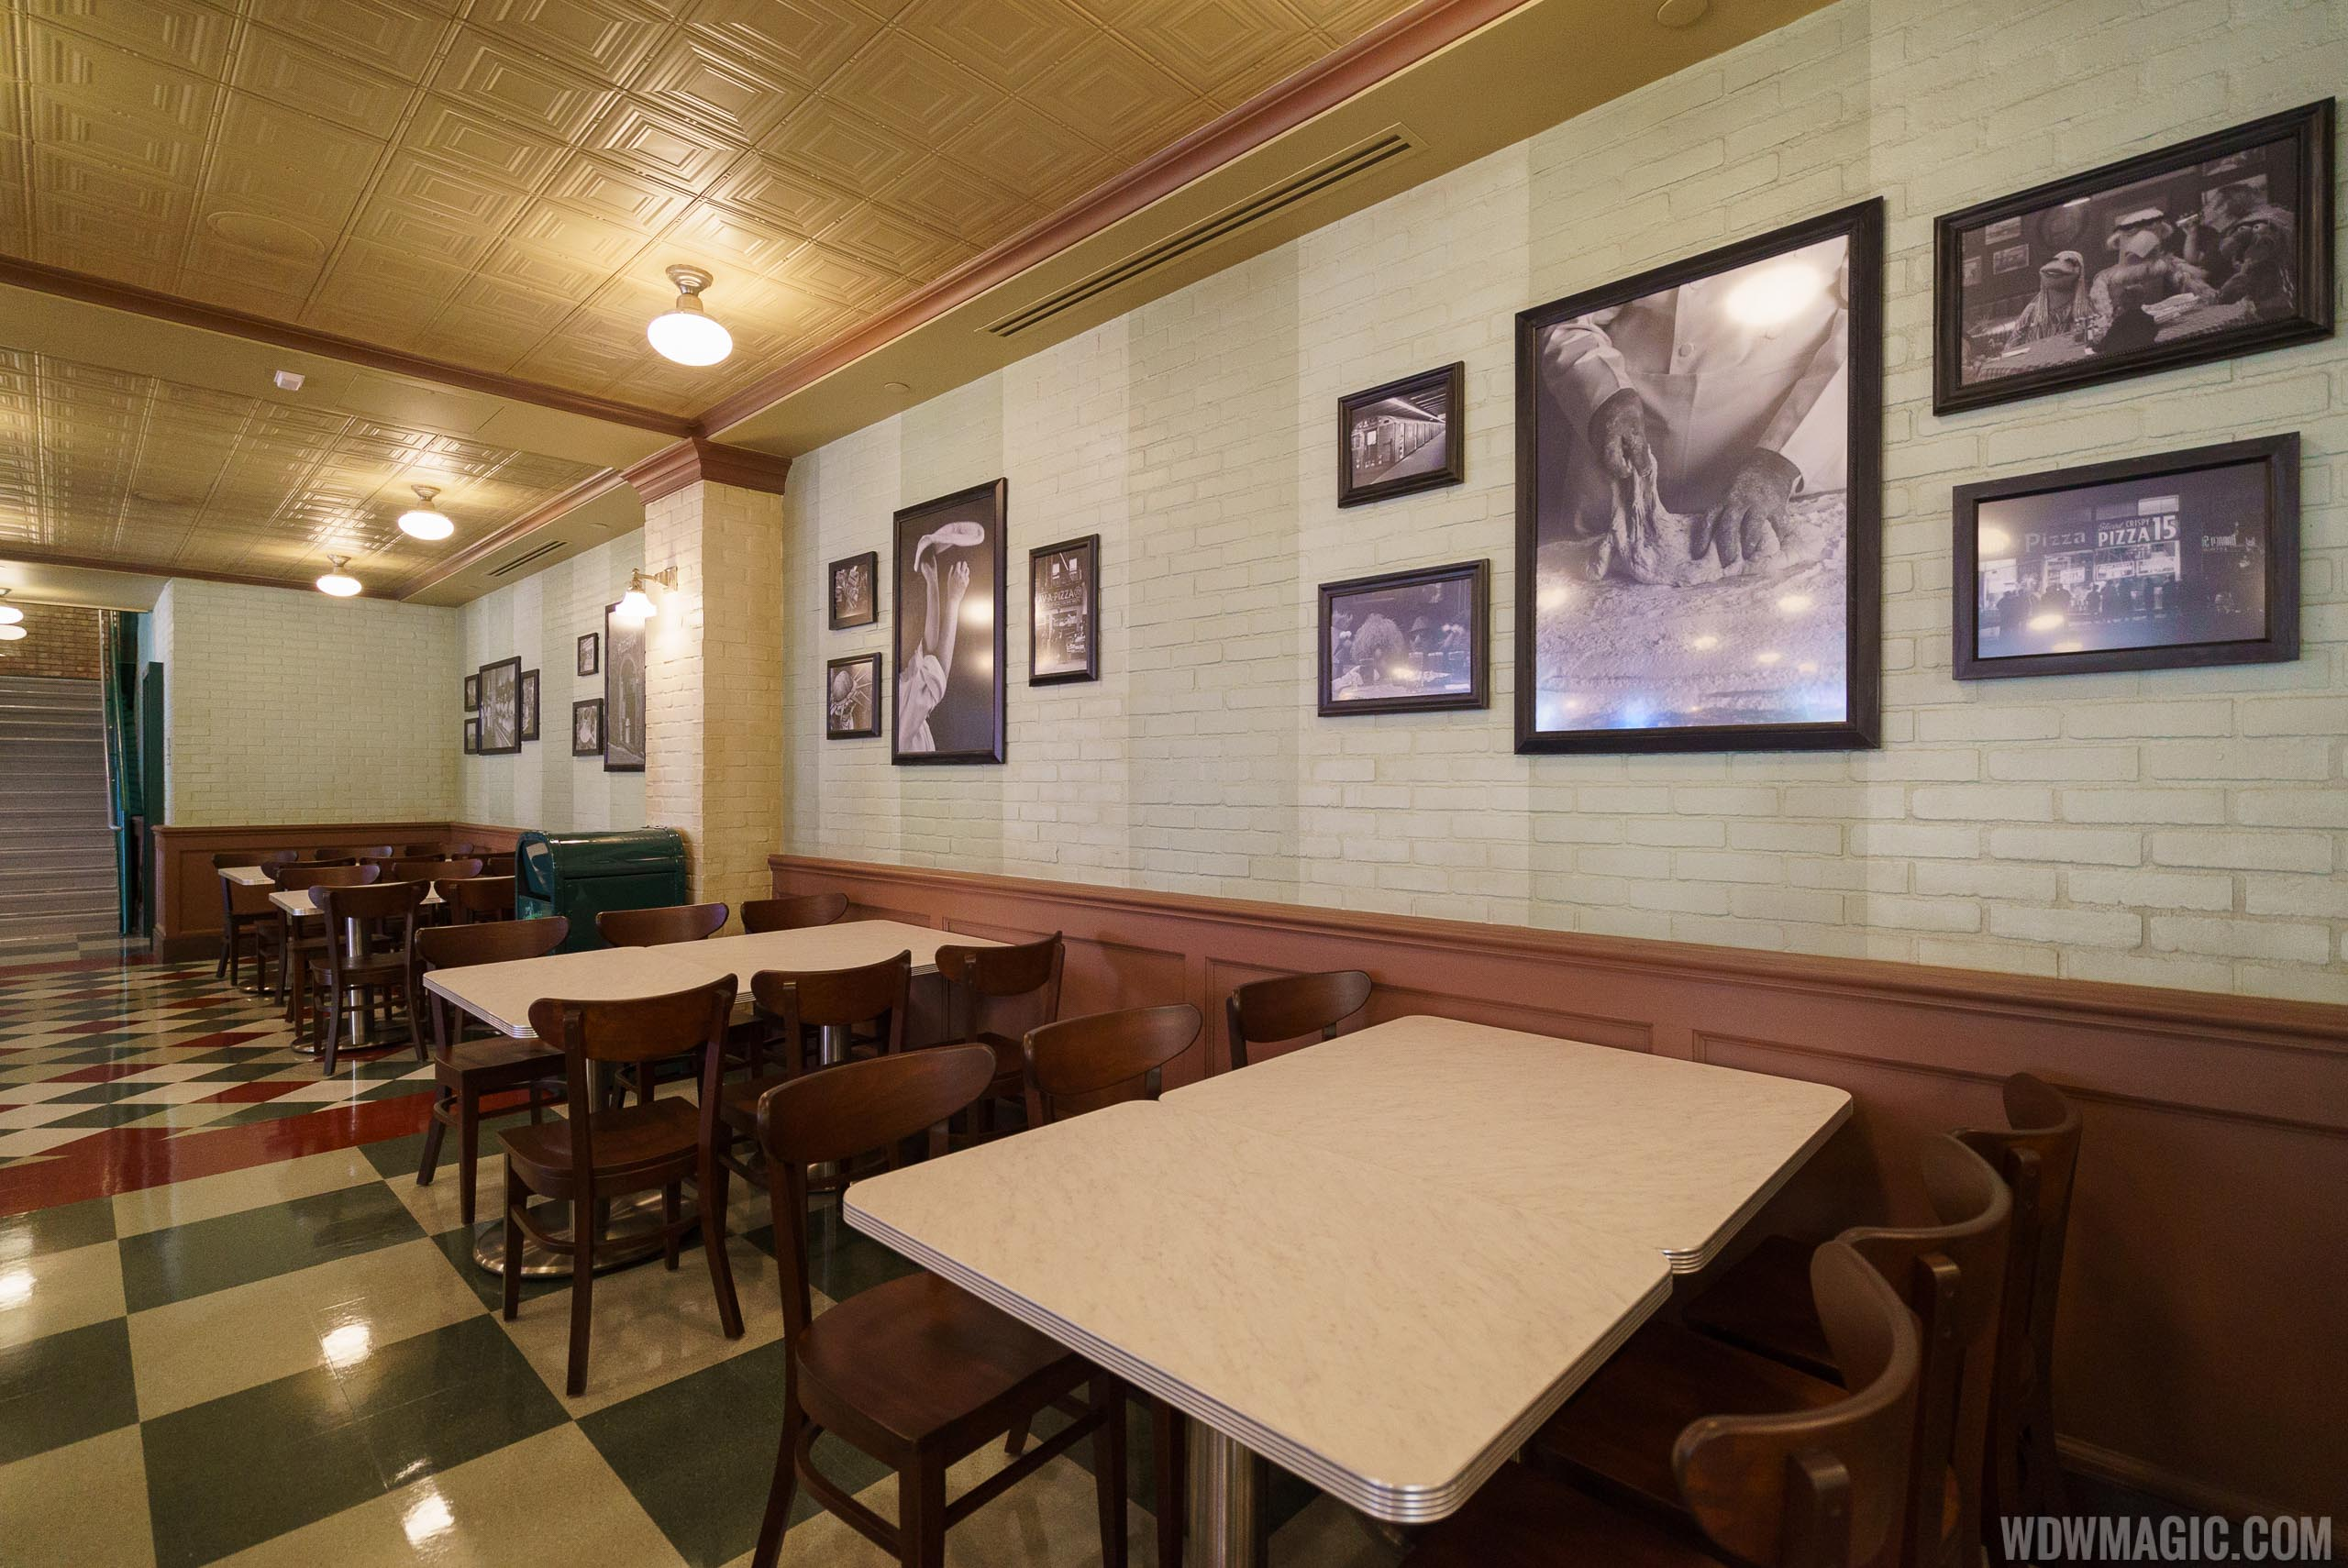 Inside PizzeRizzo - Ground floor dining room